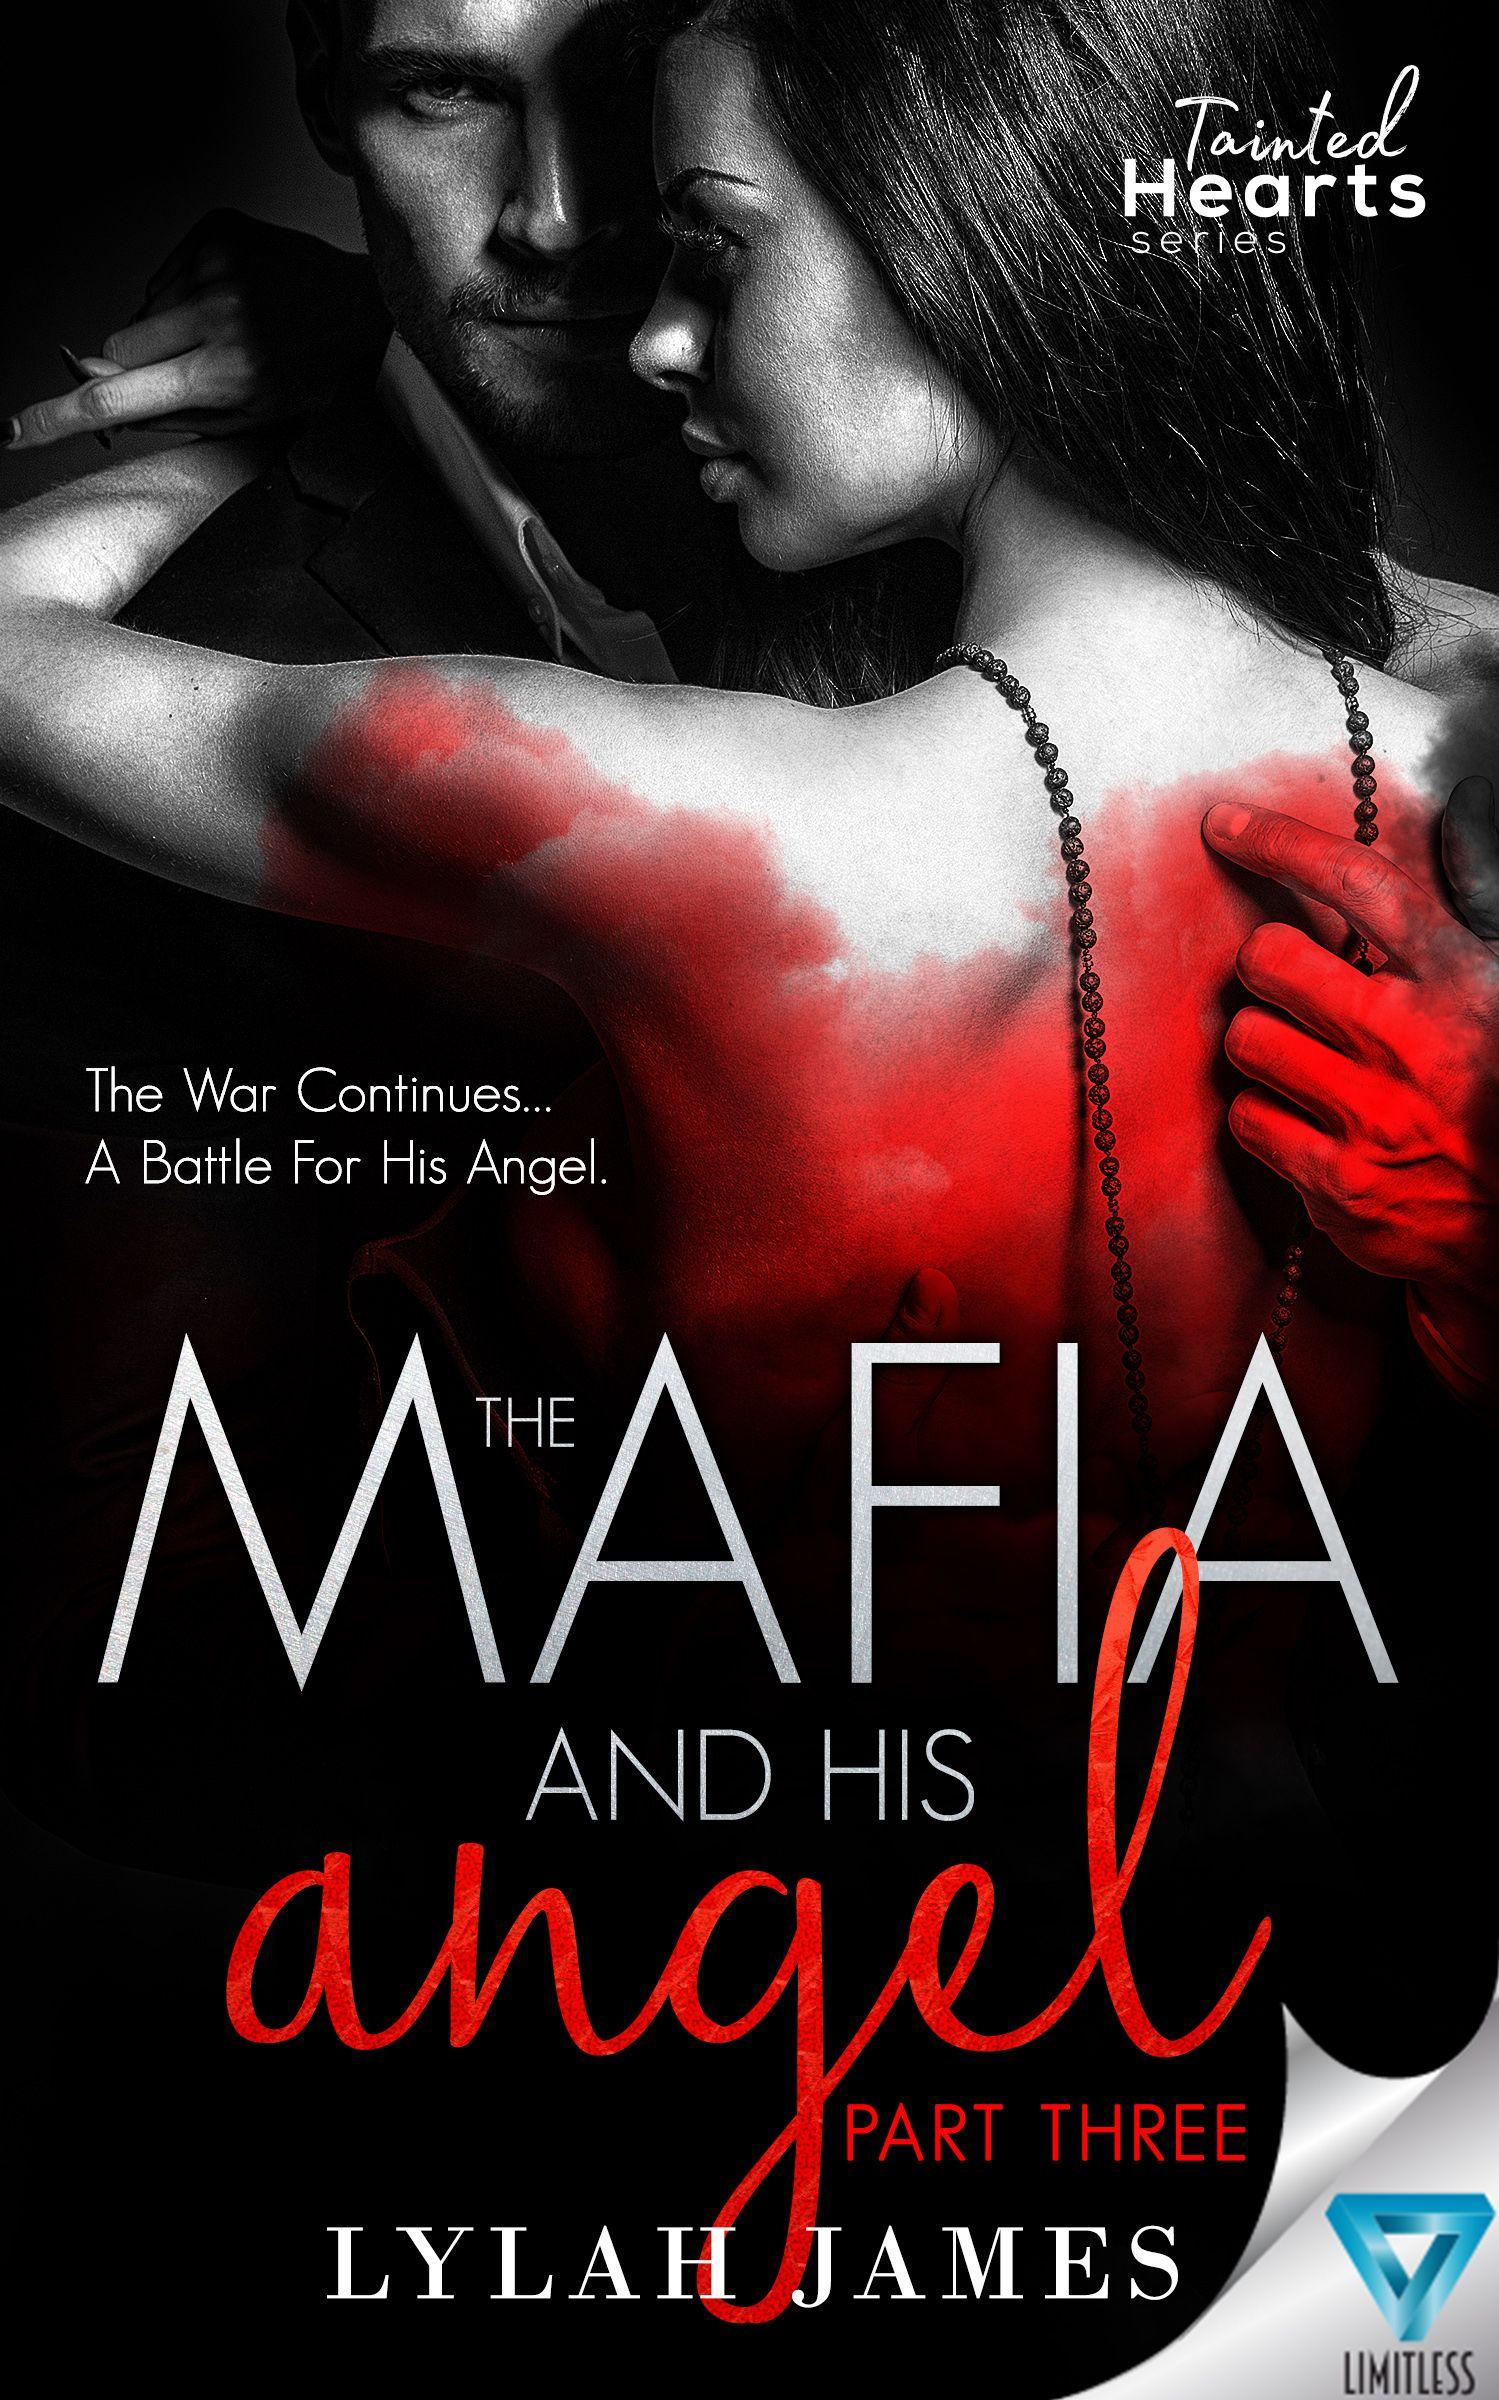 Lylah James Contemporary Mafia Romance Book Cover Design By Kitten Deranged Doctor Design Bucher Romane Bucher Romane